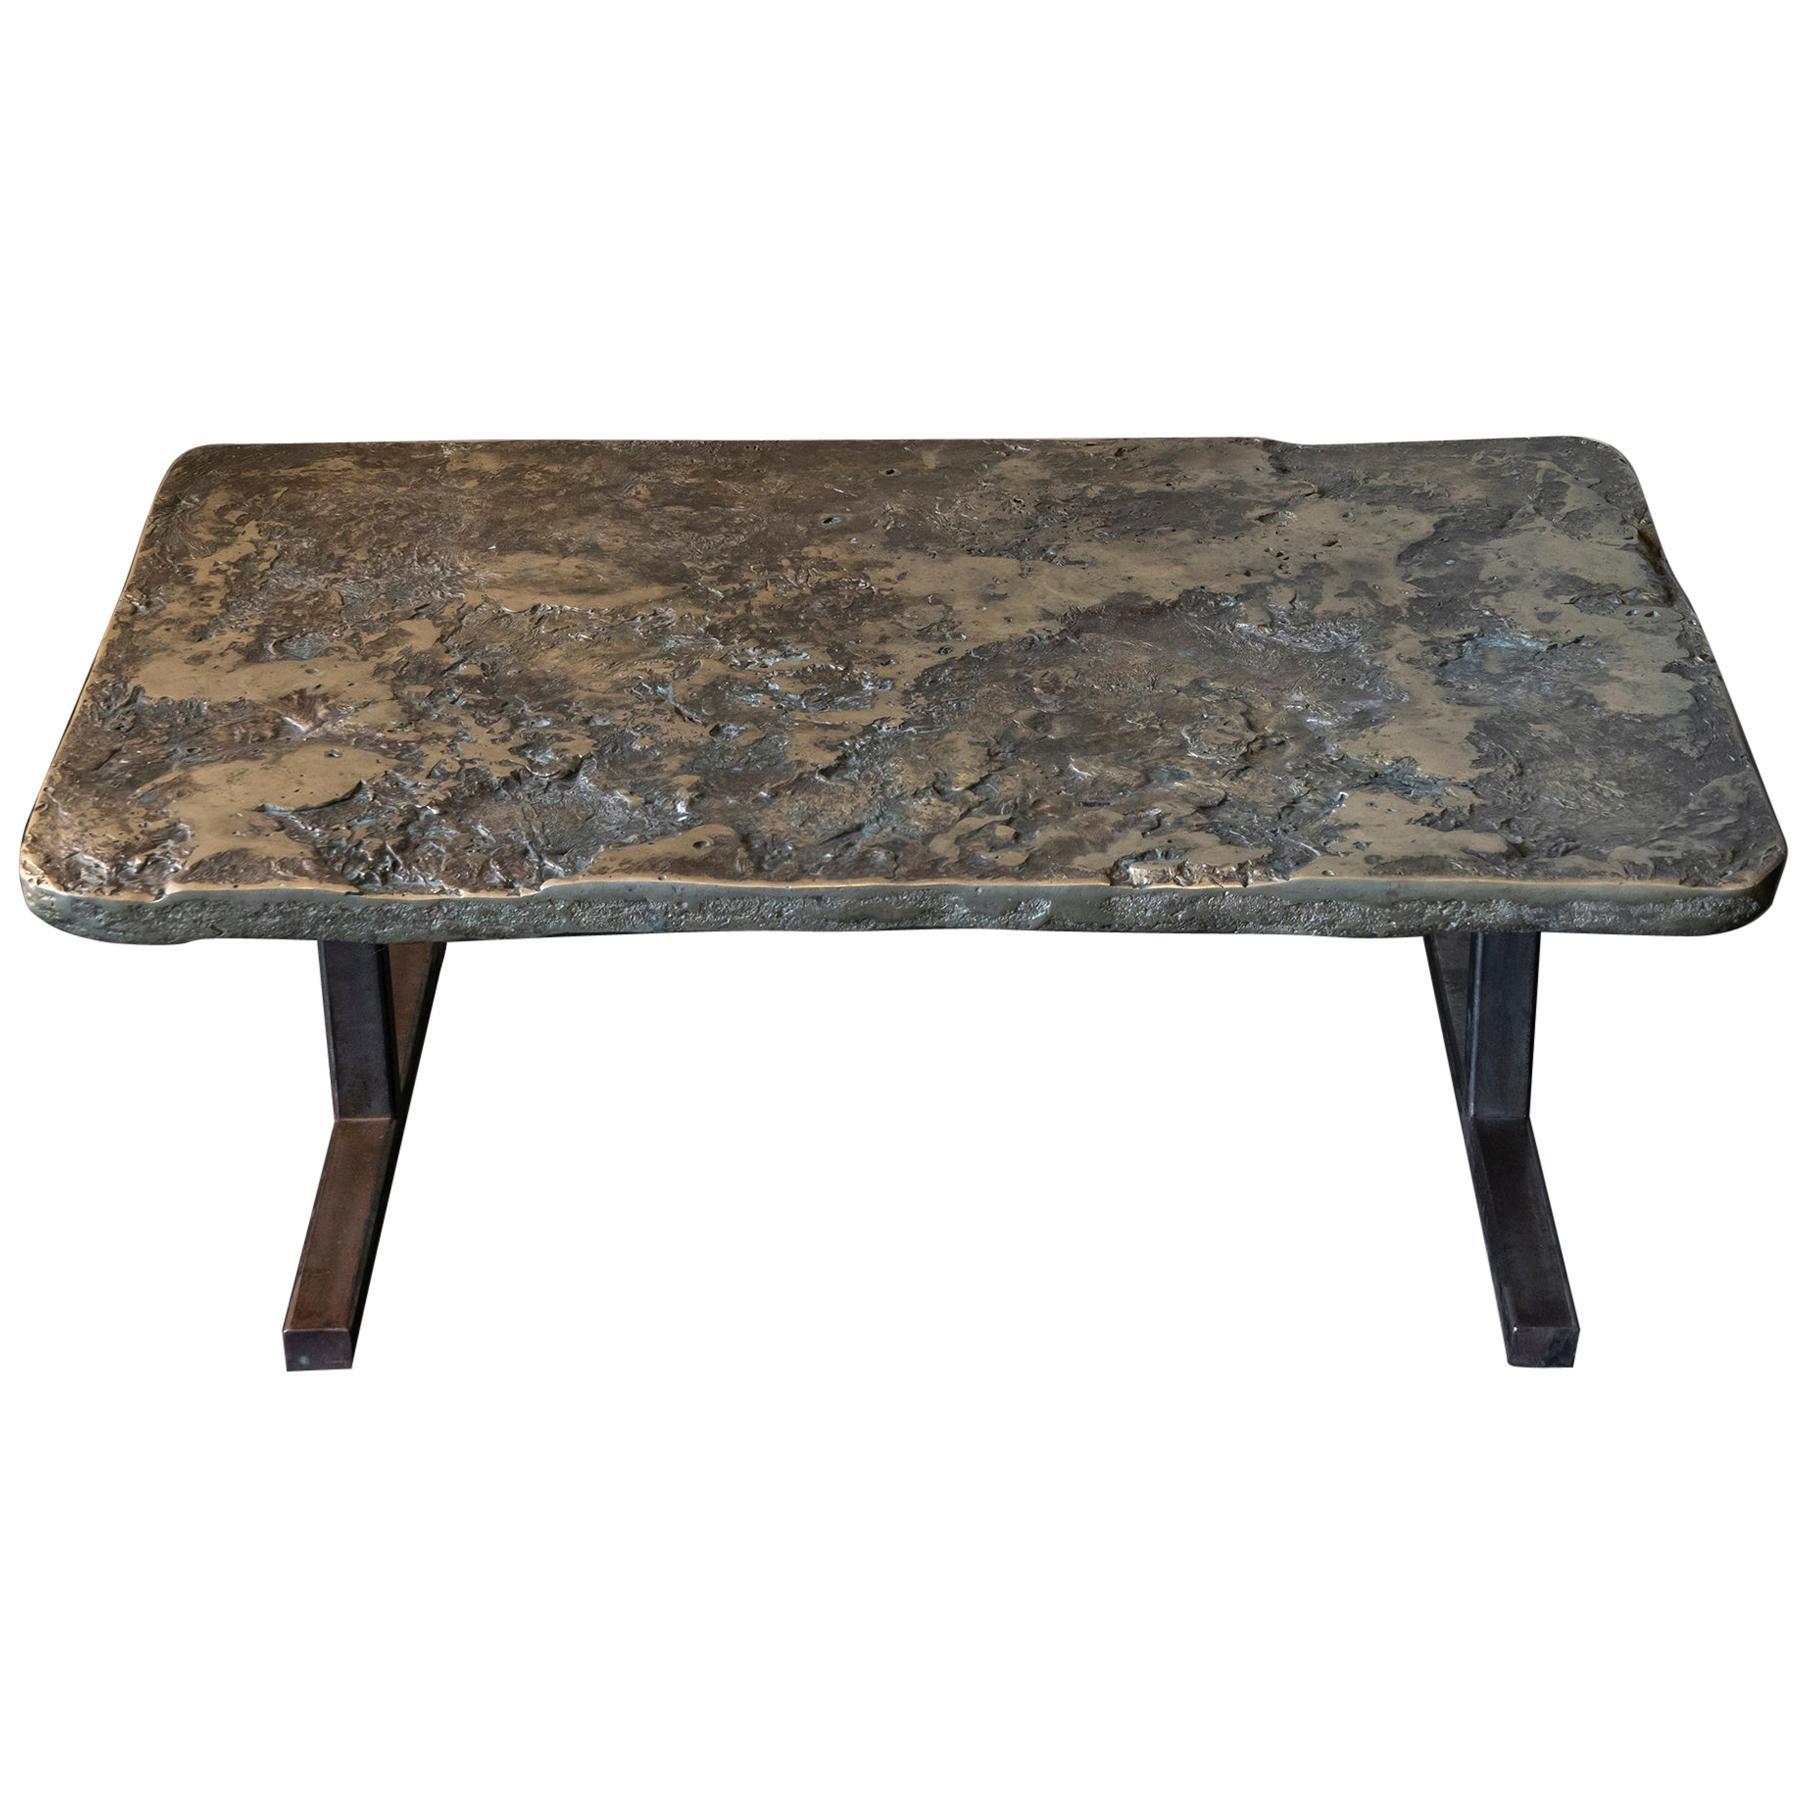 1960s Italian Brutalist Fusion/Brass Rectangular Coffee Table on Steel Base